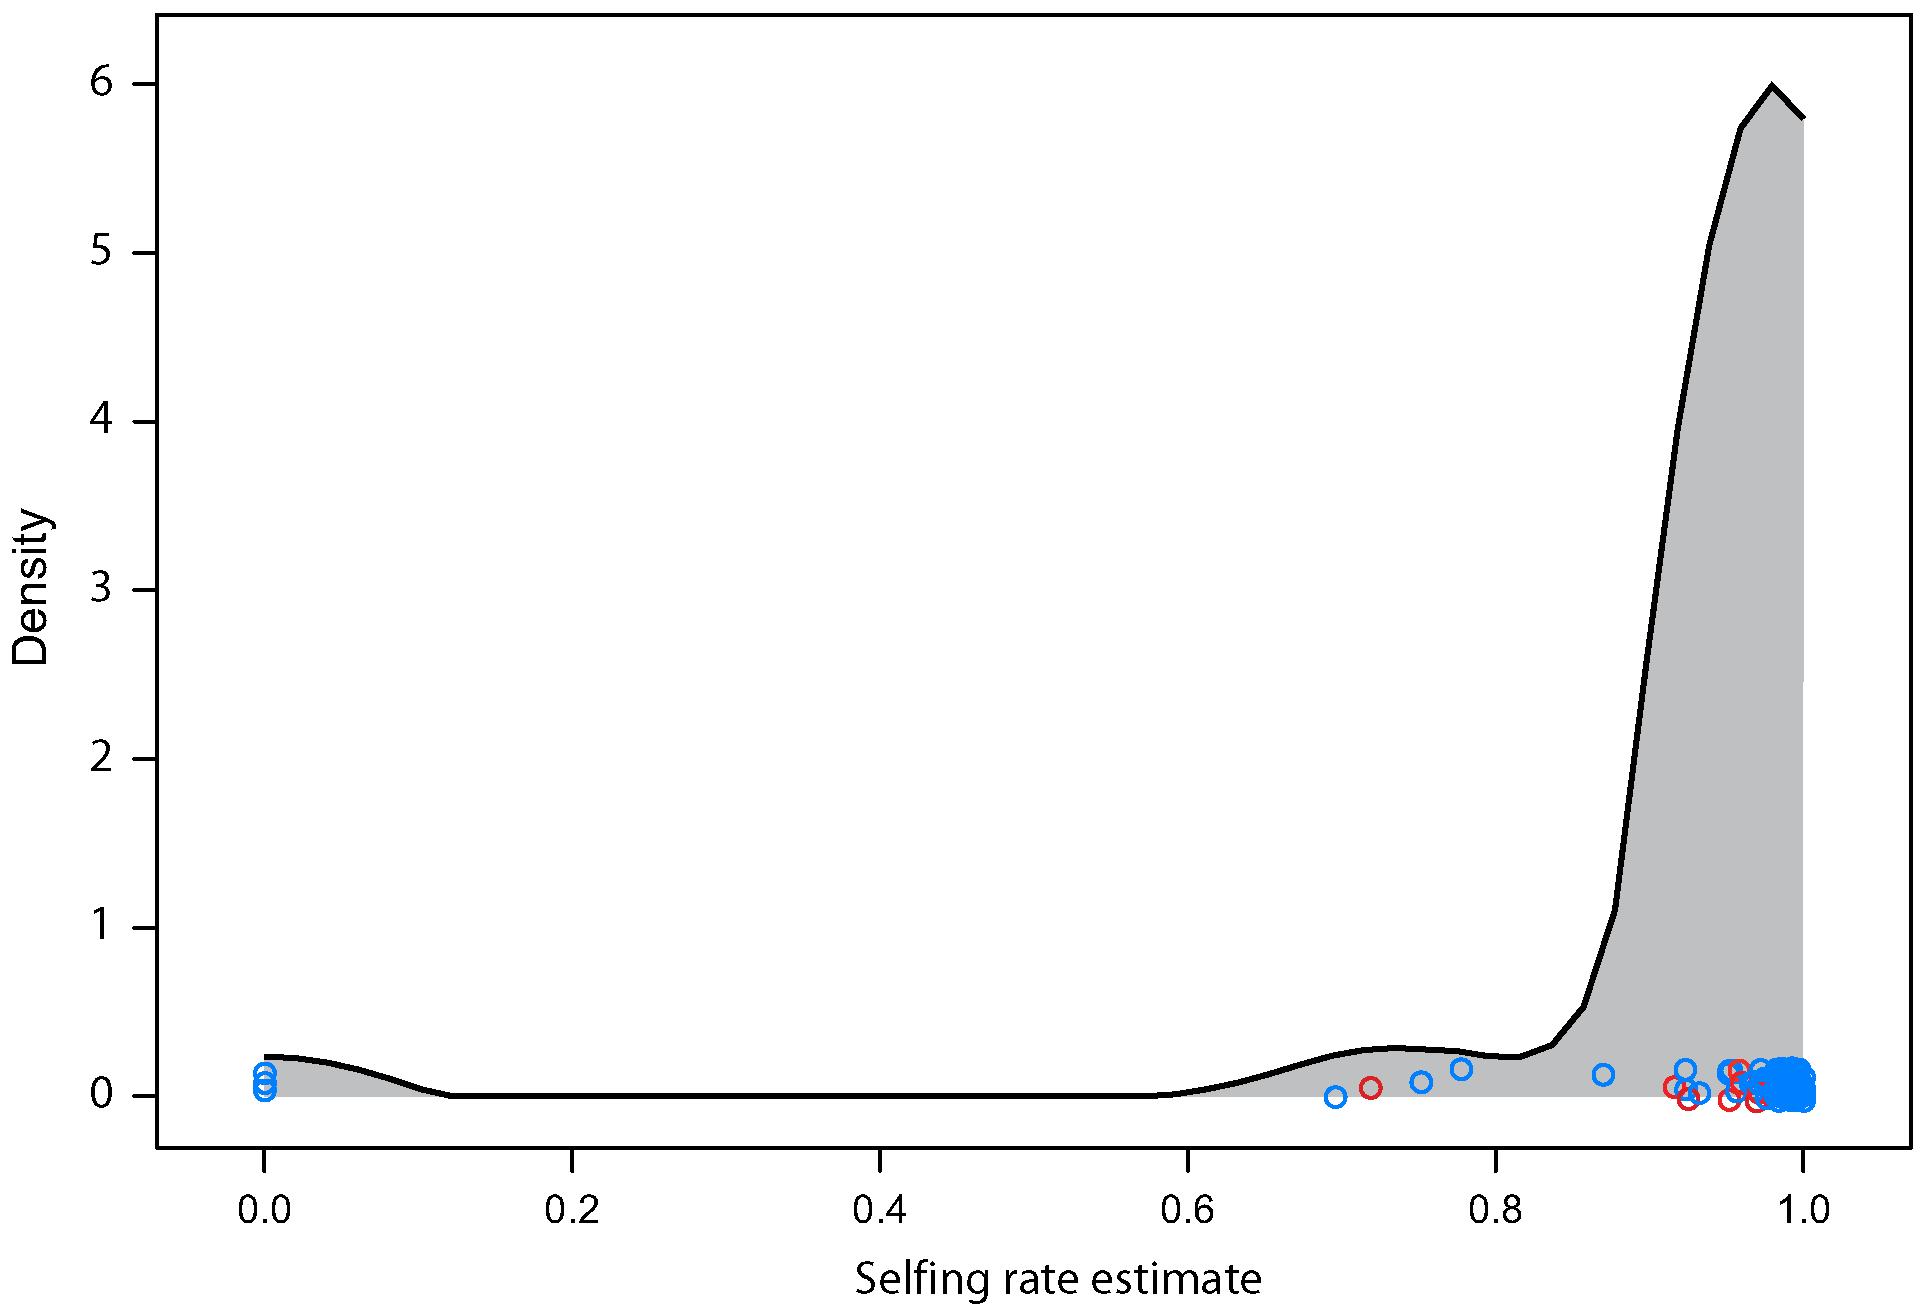 Estimated selfing rate per field site.